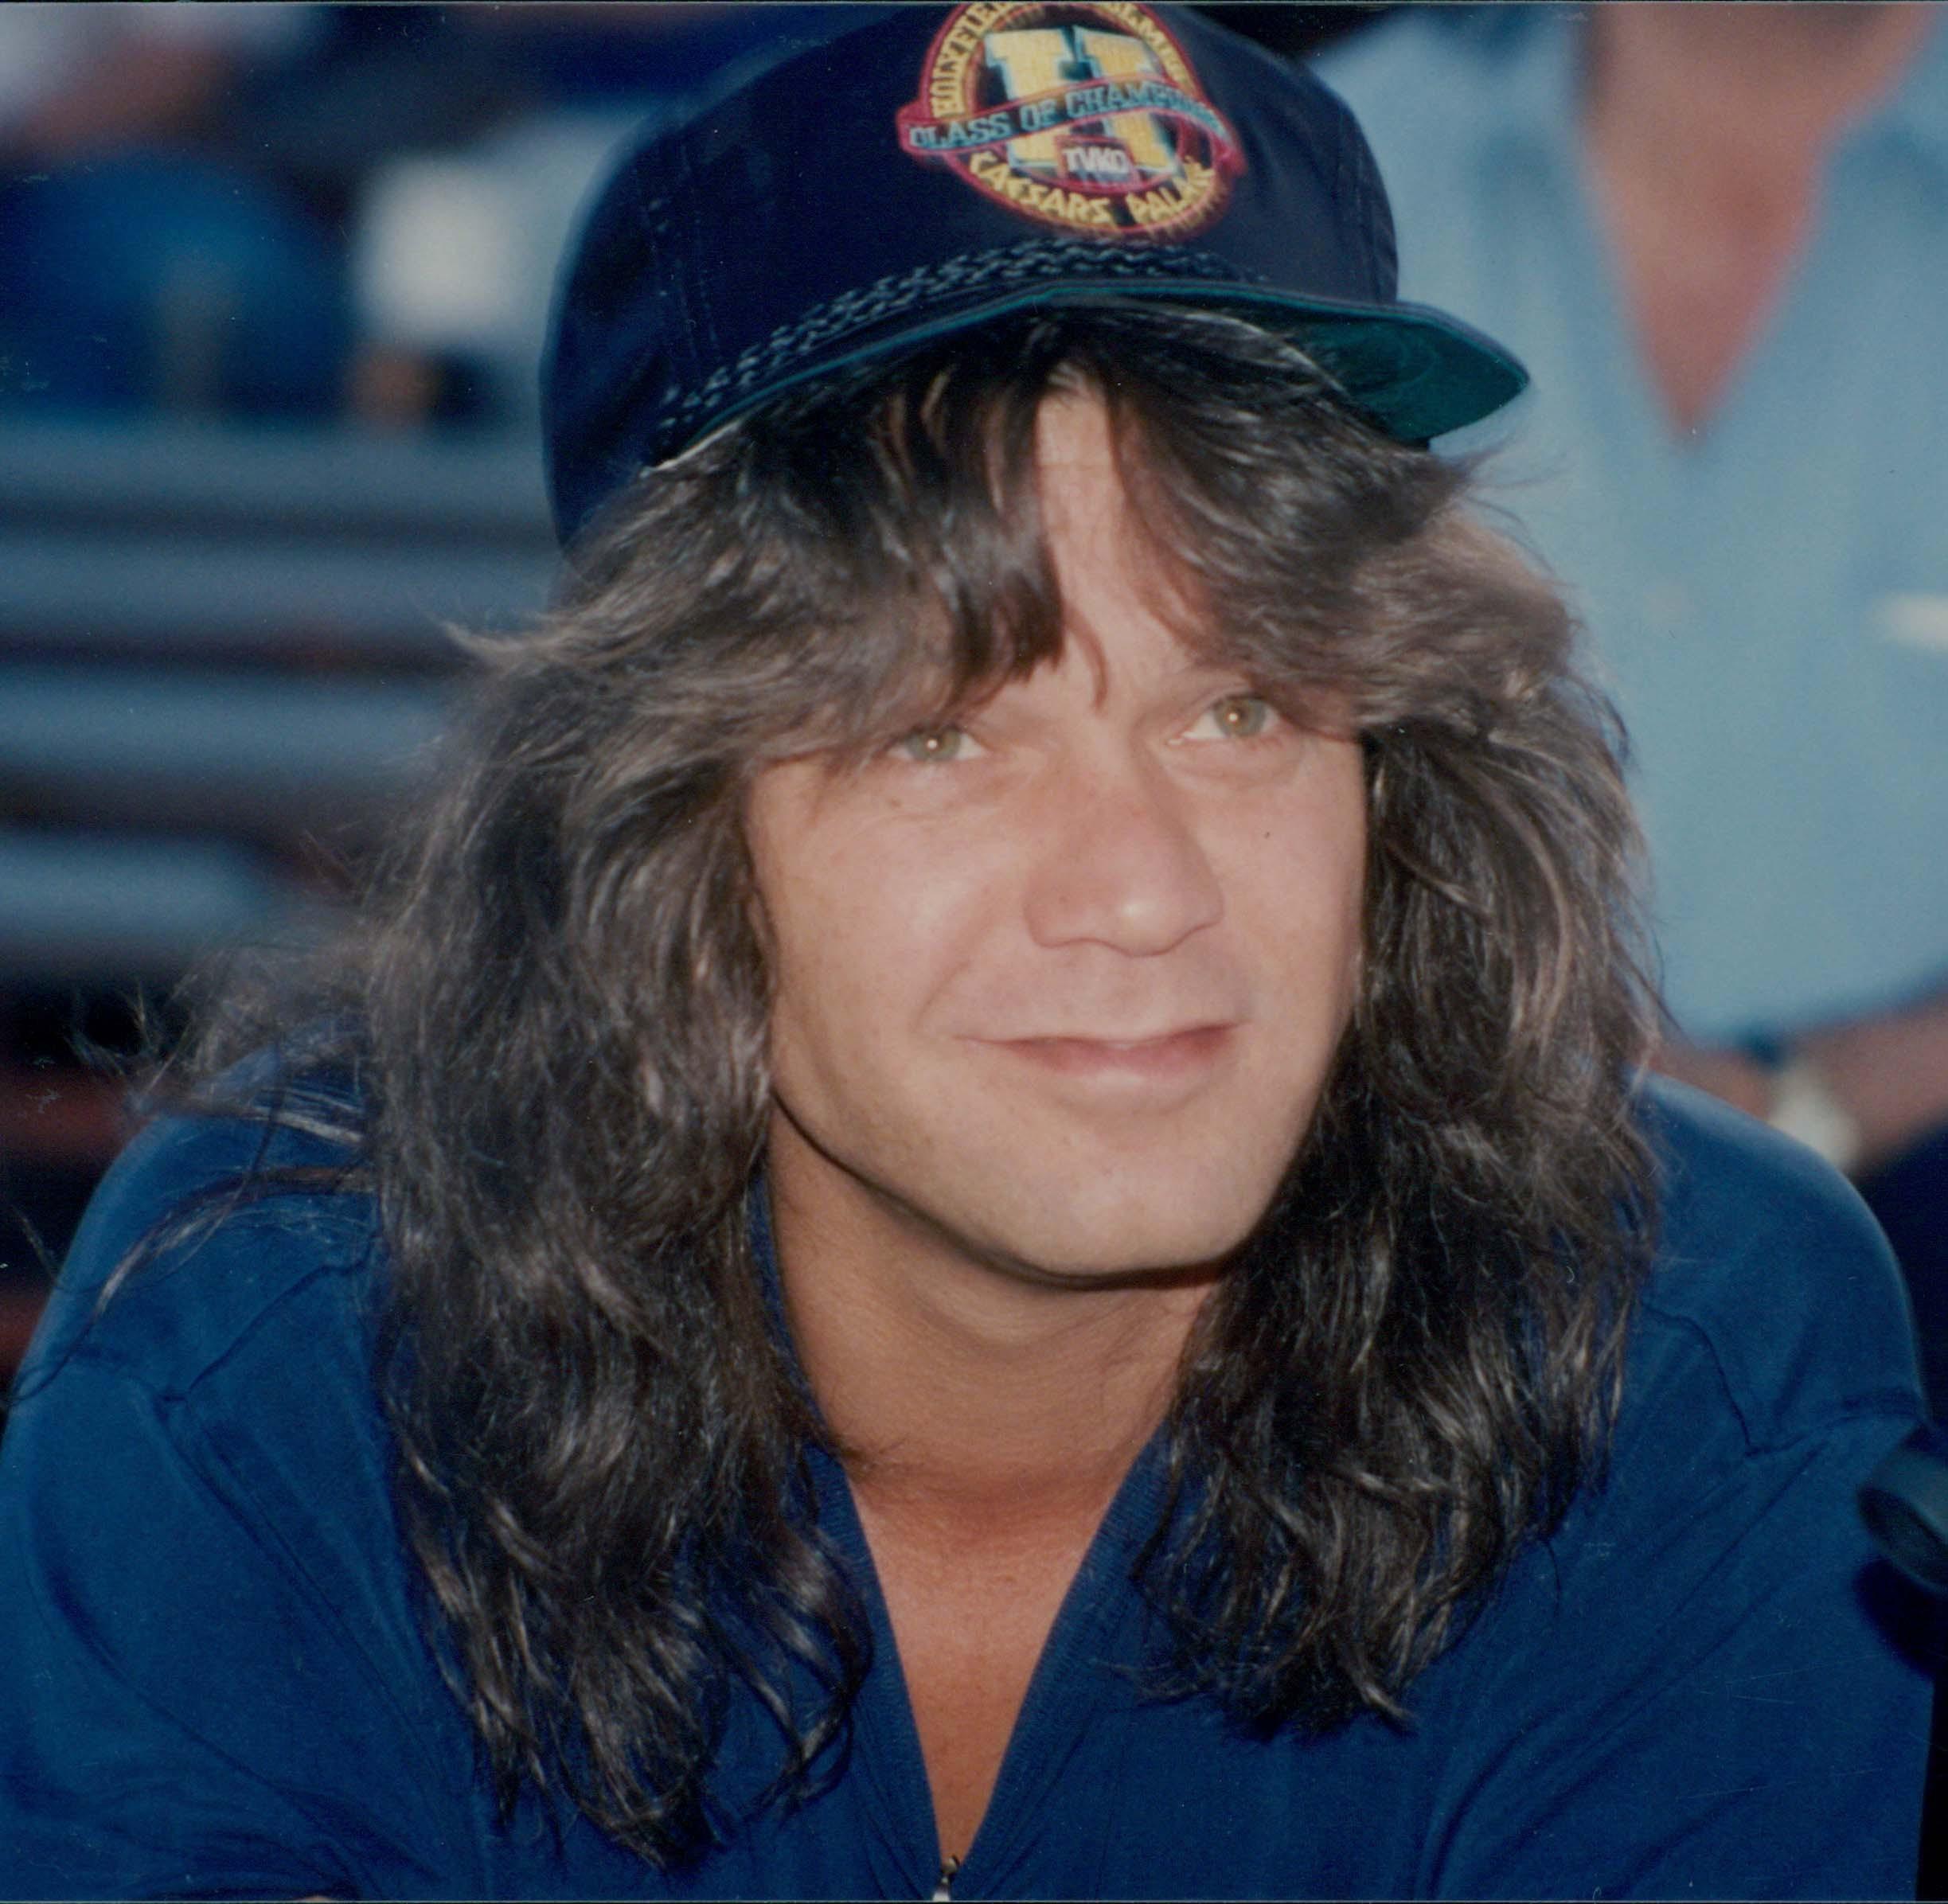 Breaking: Eddie Van Halen Dies At 65 From Cancer